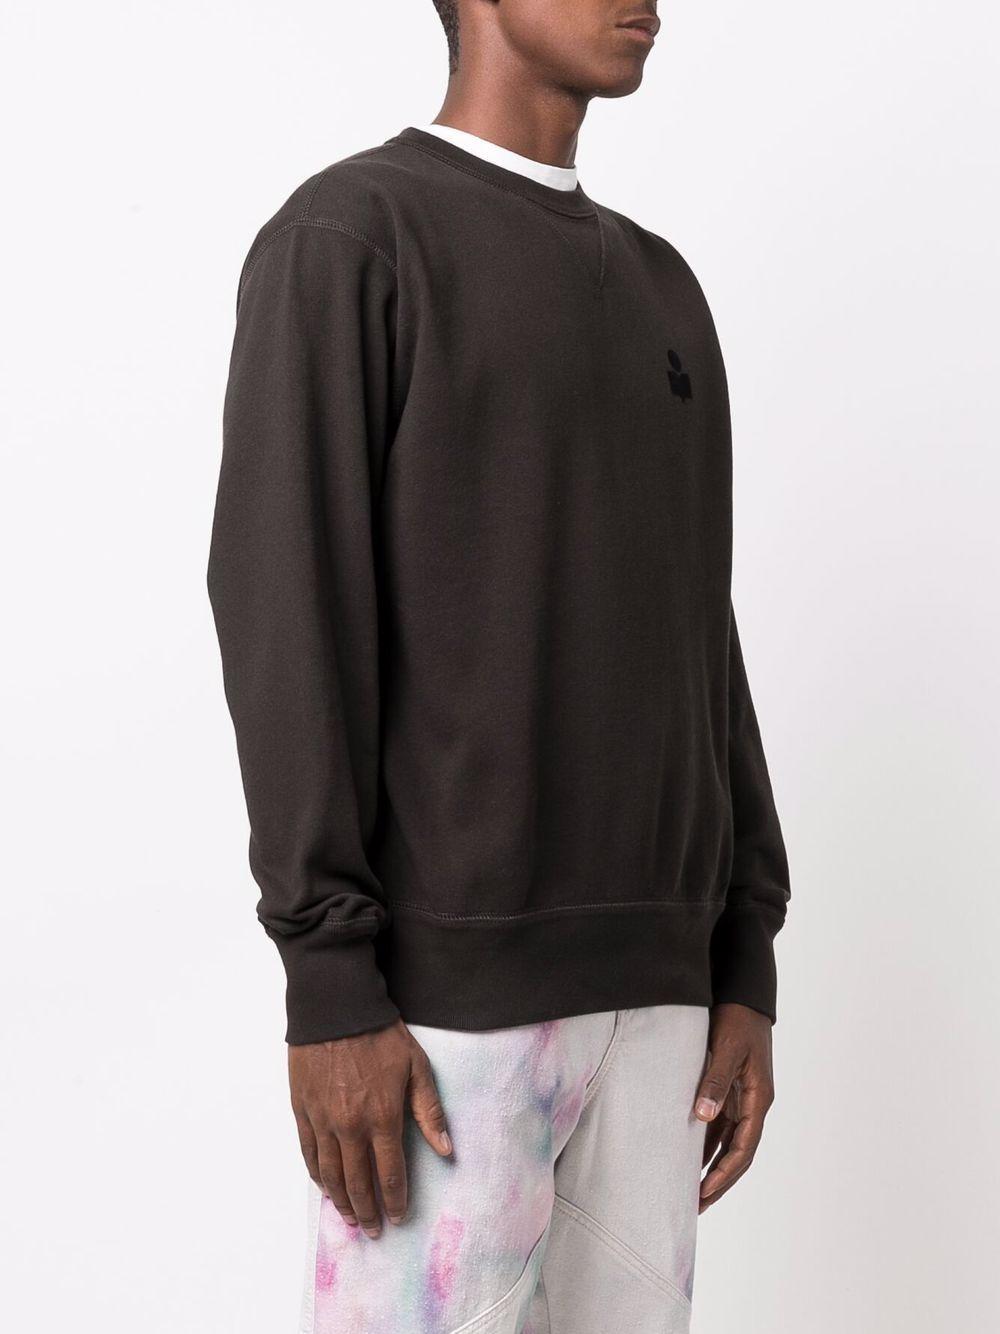 mike crewneck man black in cotton ISABEL MARANT | Sweatshirts | 00MSW0057-00M003H02FK